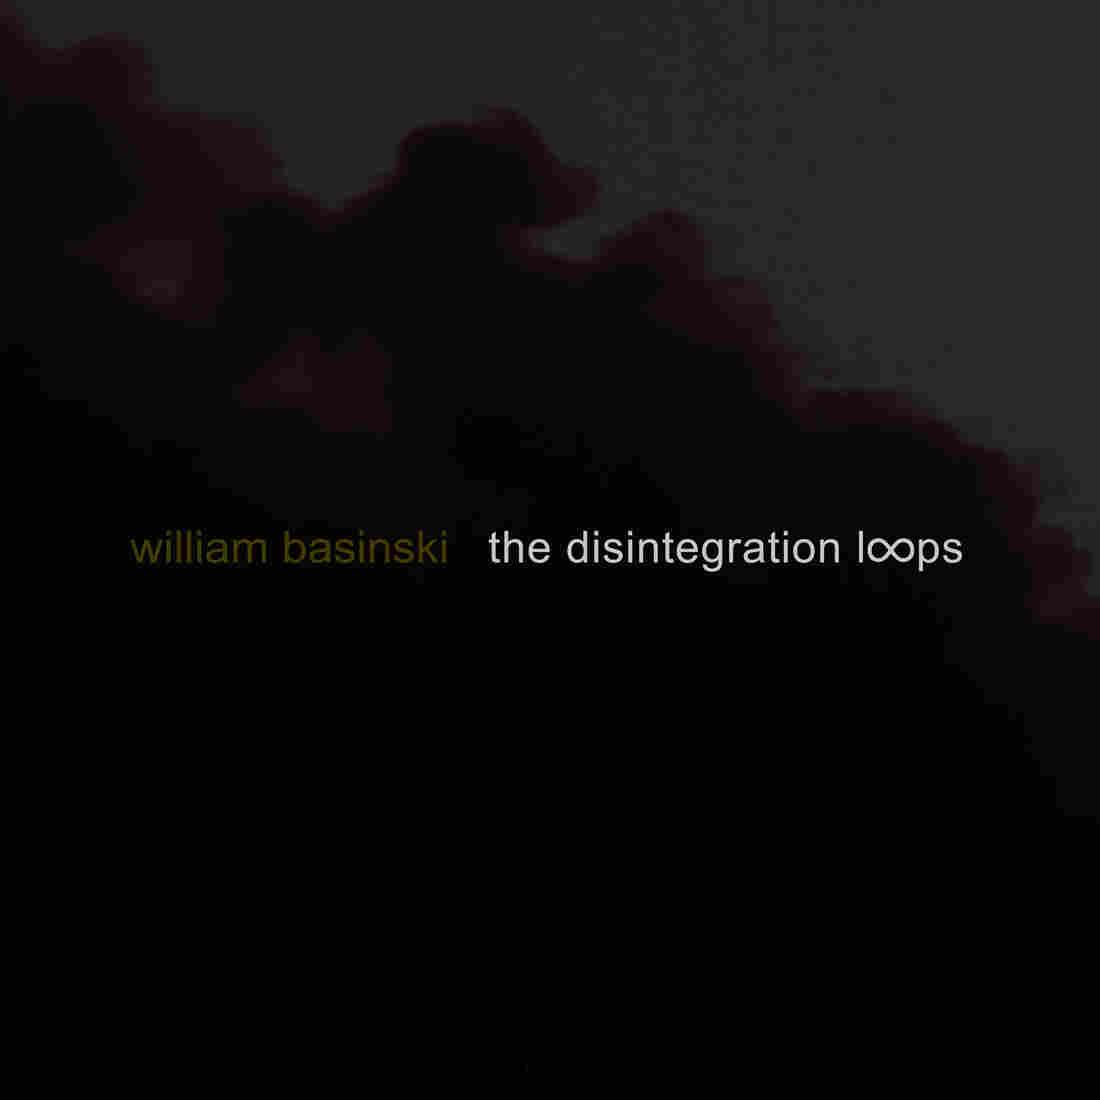 The Disintegration Loops.